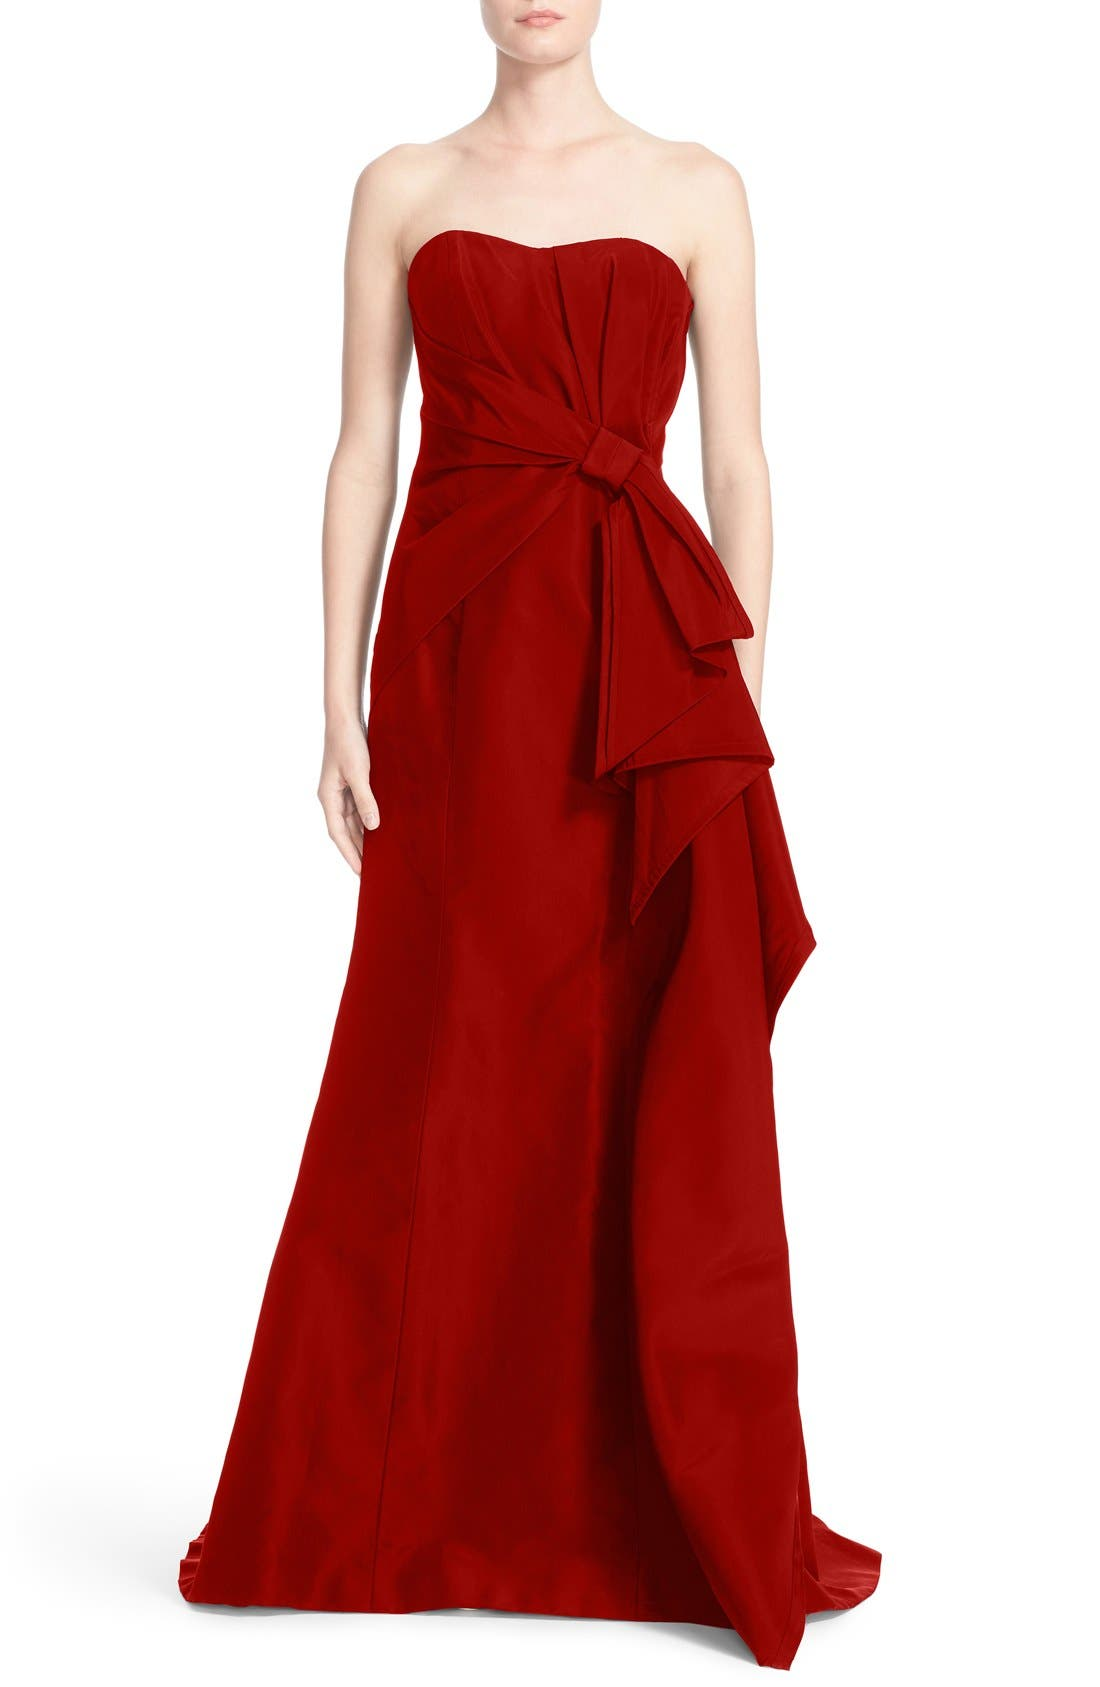 Carolina Herrera Bow Detail Strapless Silk Faille Gown